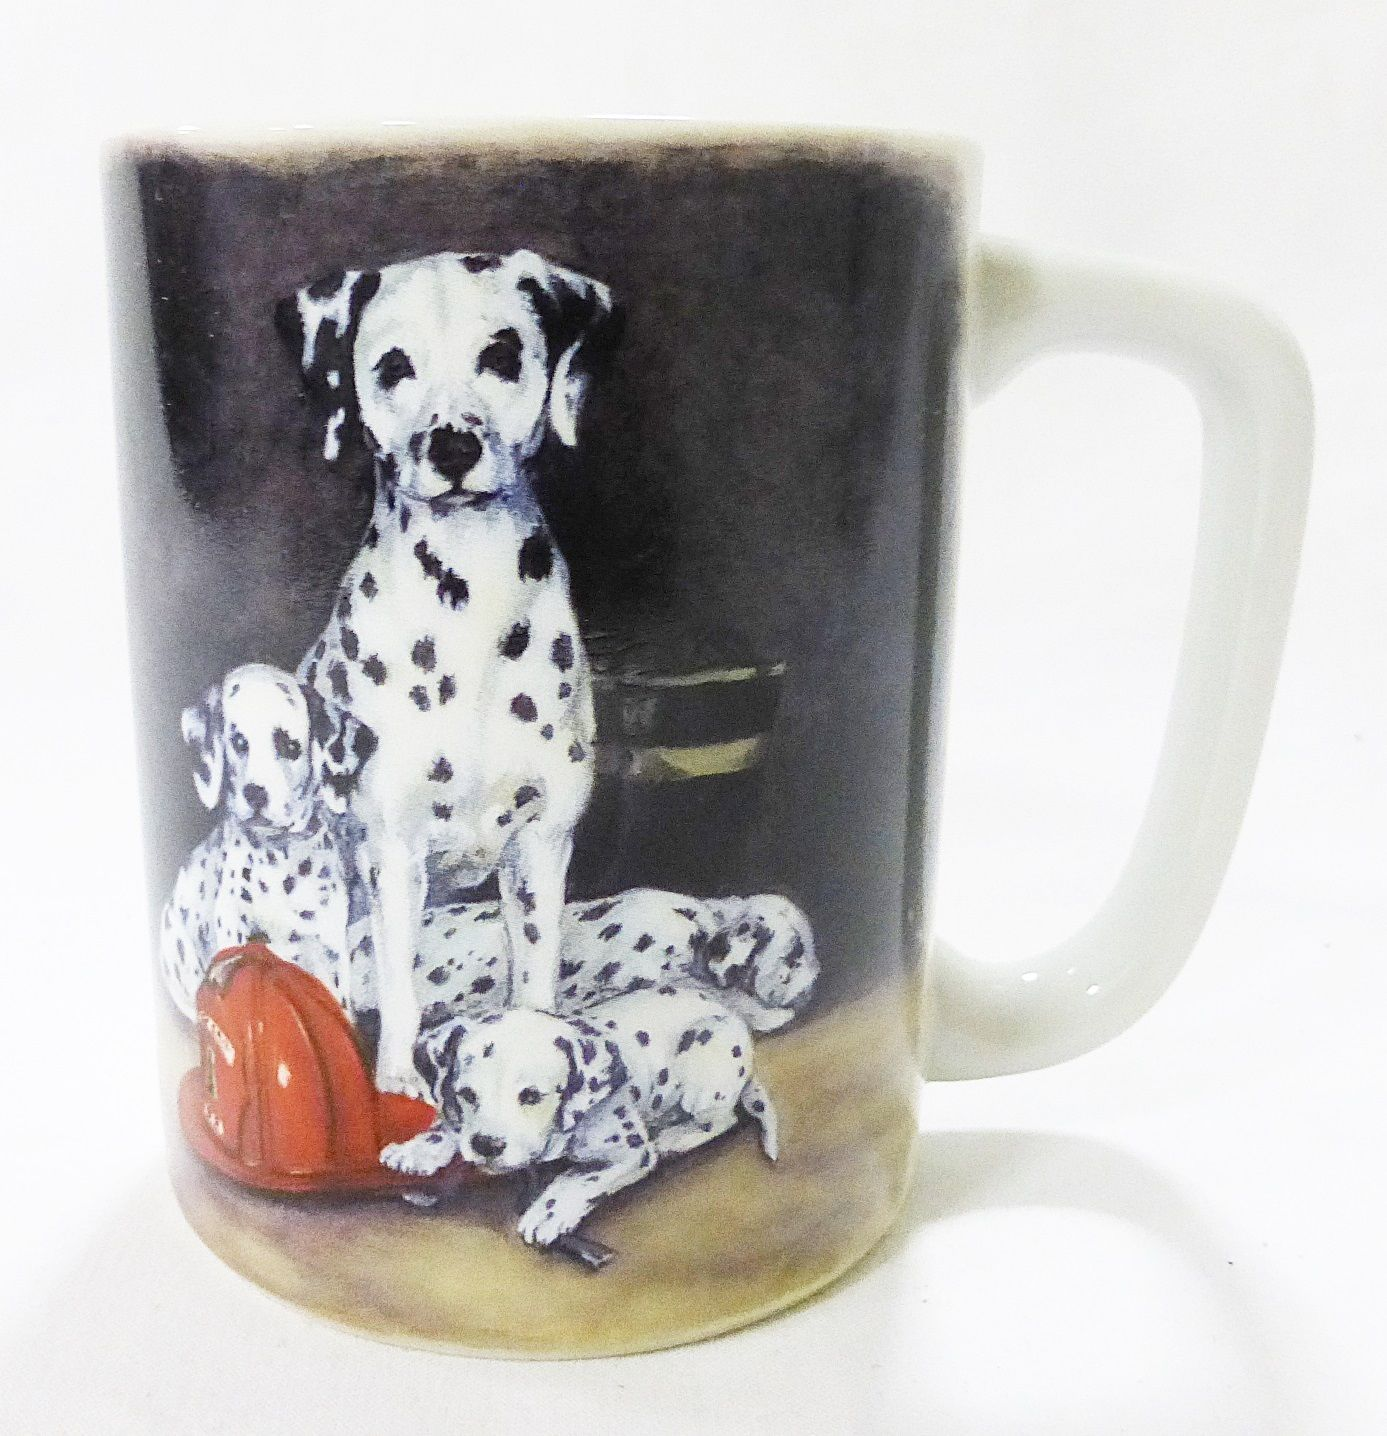 Otagiri japan dalmatian coffee mug cup fireman puppy dog linda picken vintage - $18.80